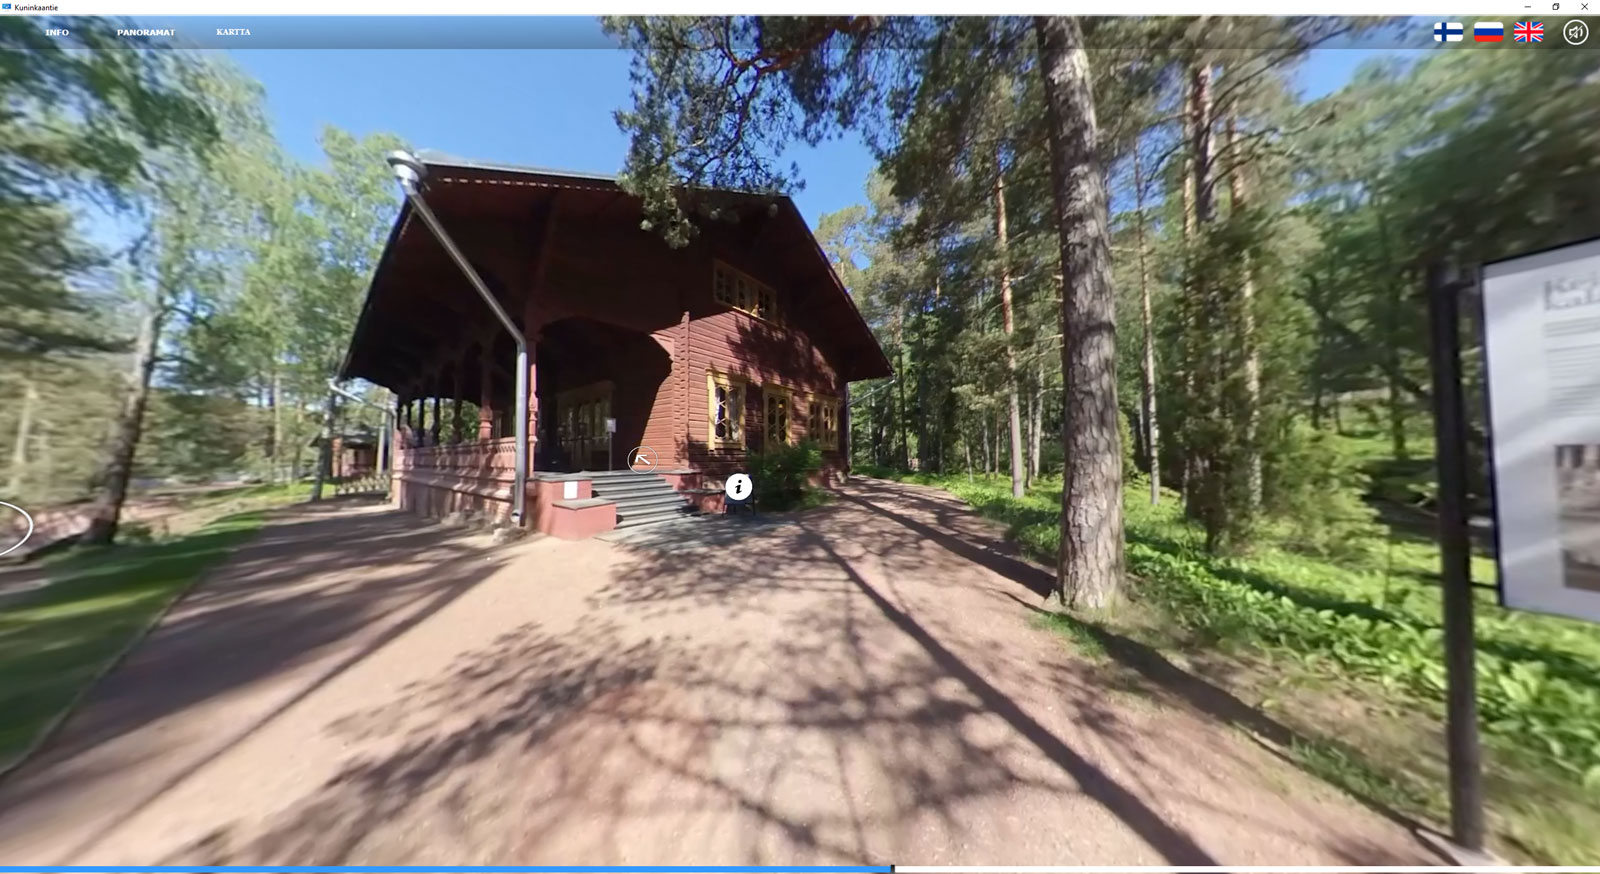 A fishing hut viewed inside a 360-degree photo program.